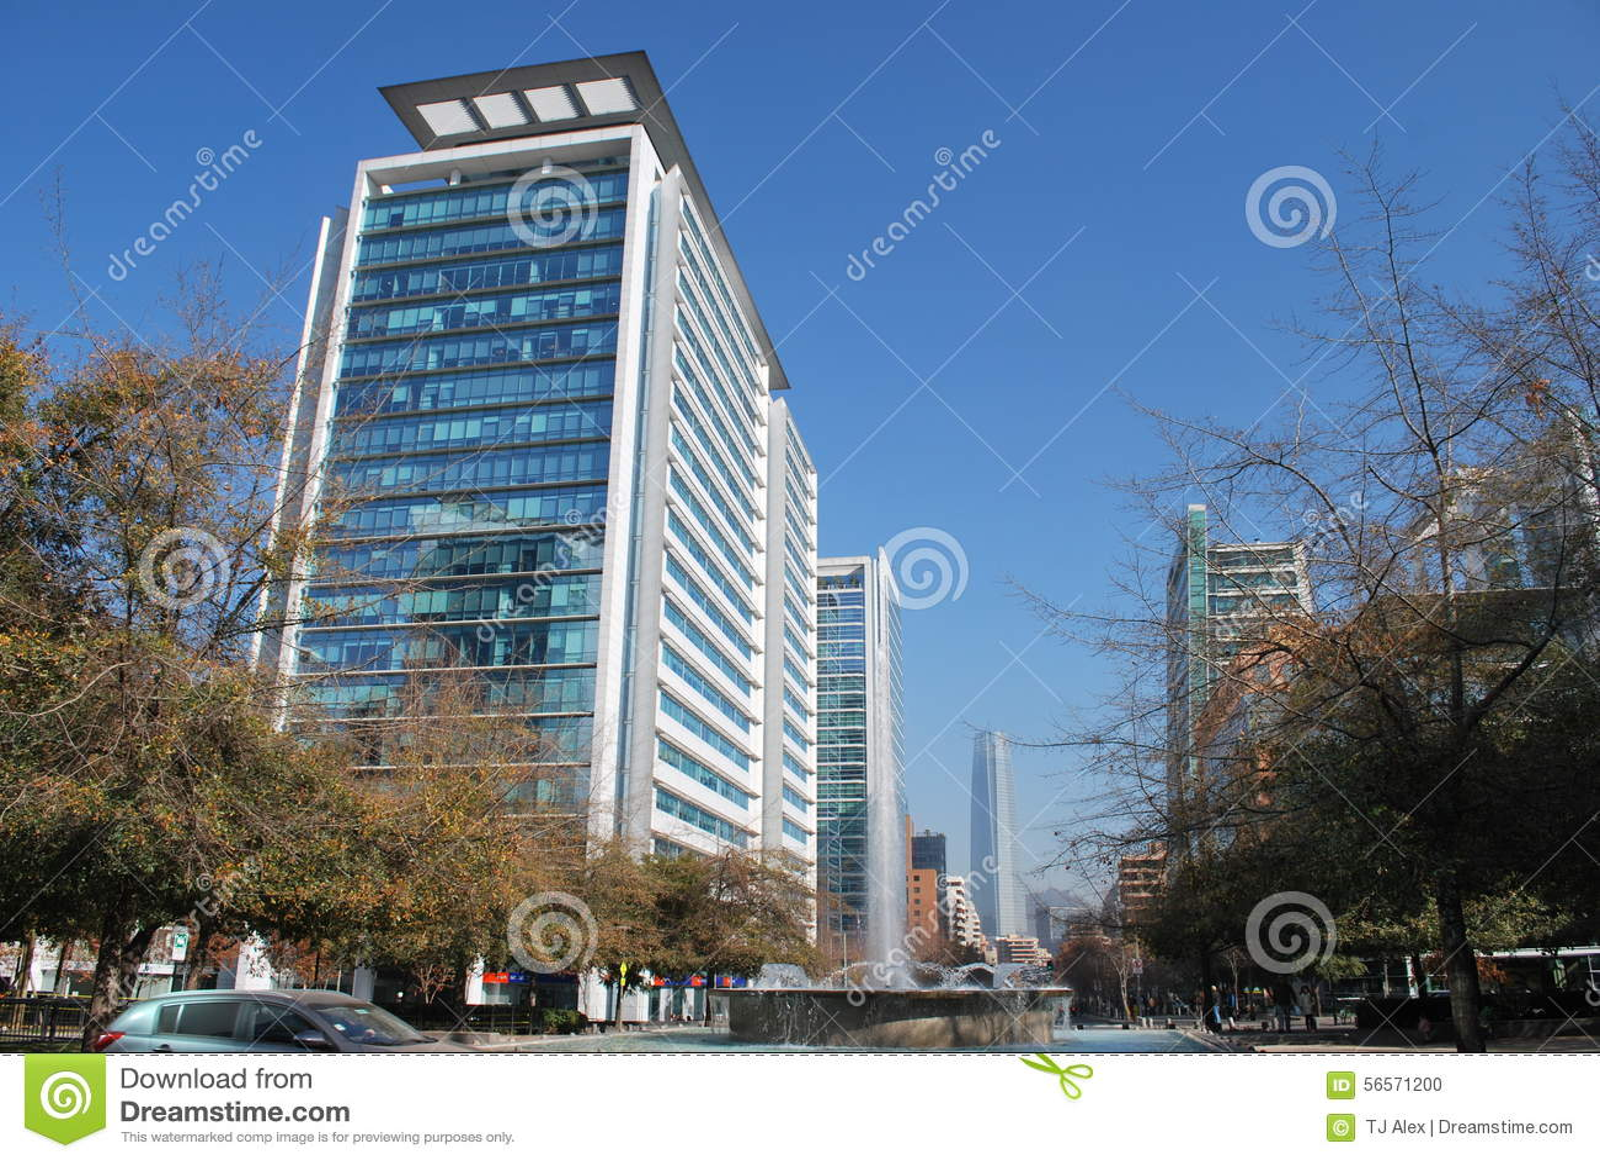 Download Καταπληκτικοί ουρανοξύστες στο Σαντιάγο, Χιλή Στοκ Εικόνες - εικόνα από σπίτια, ορόσημο: 56571200